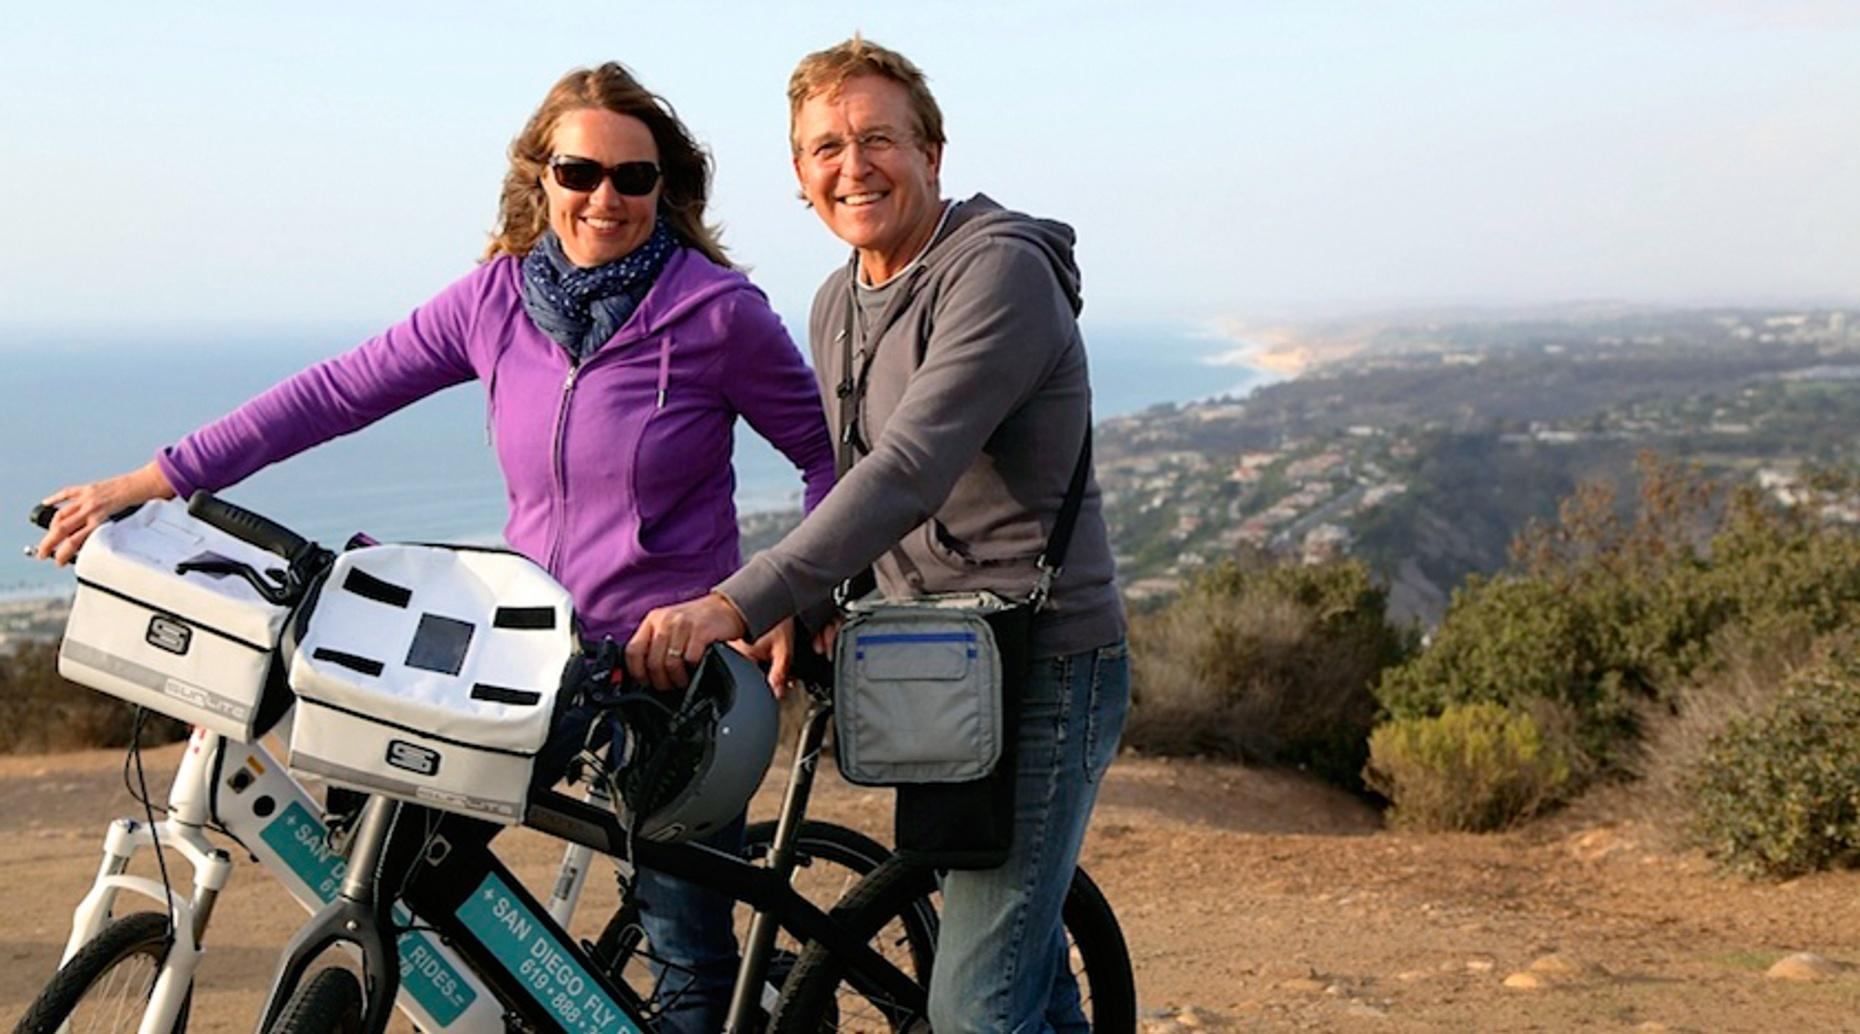 La Jolla Sunset Electric Bike Cruise